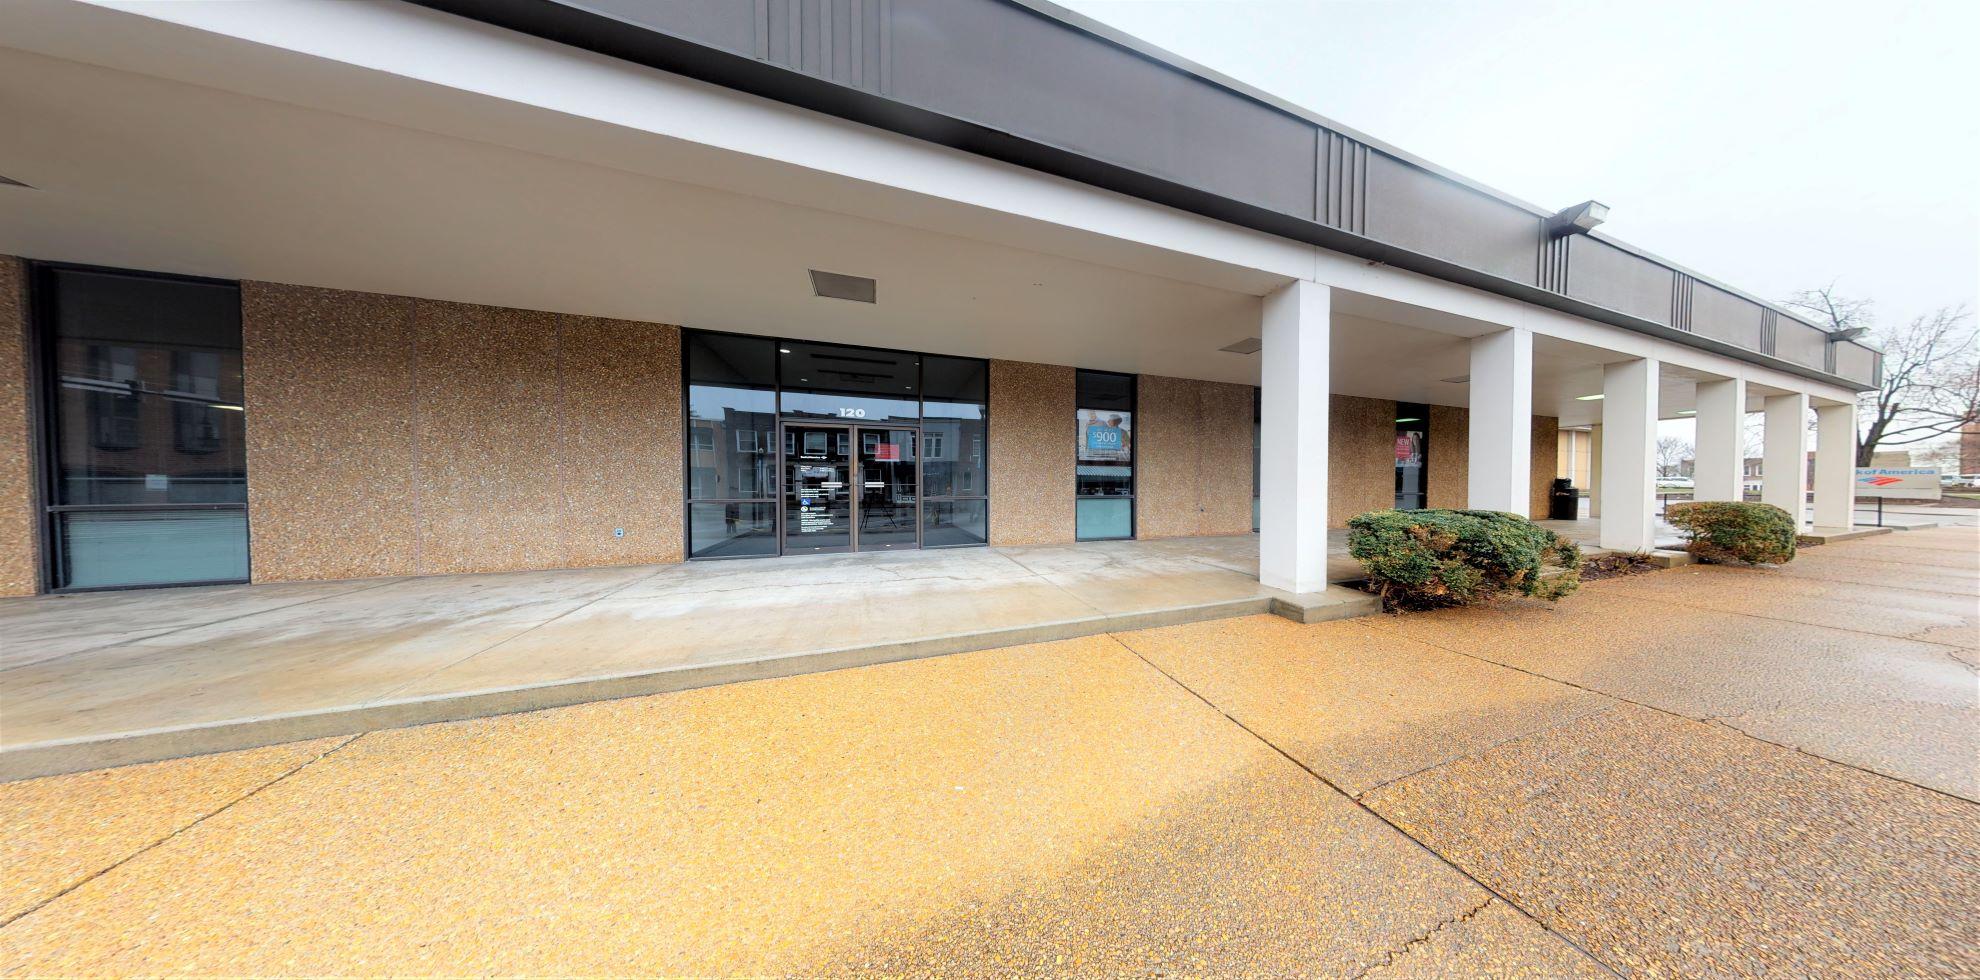 Bank of America financial center with walk-up ATM   120 E Main St, Murfreesboro, TN 37130